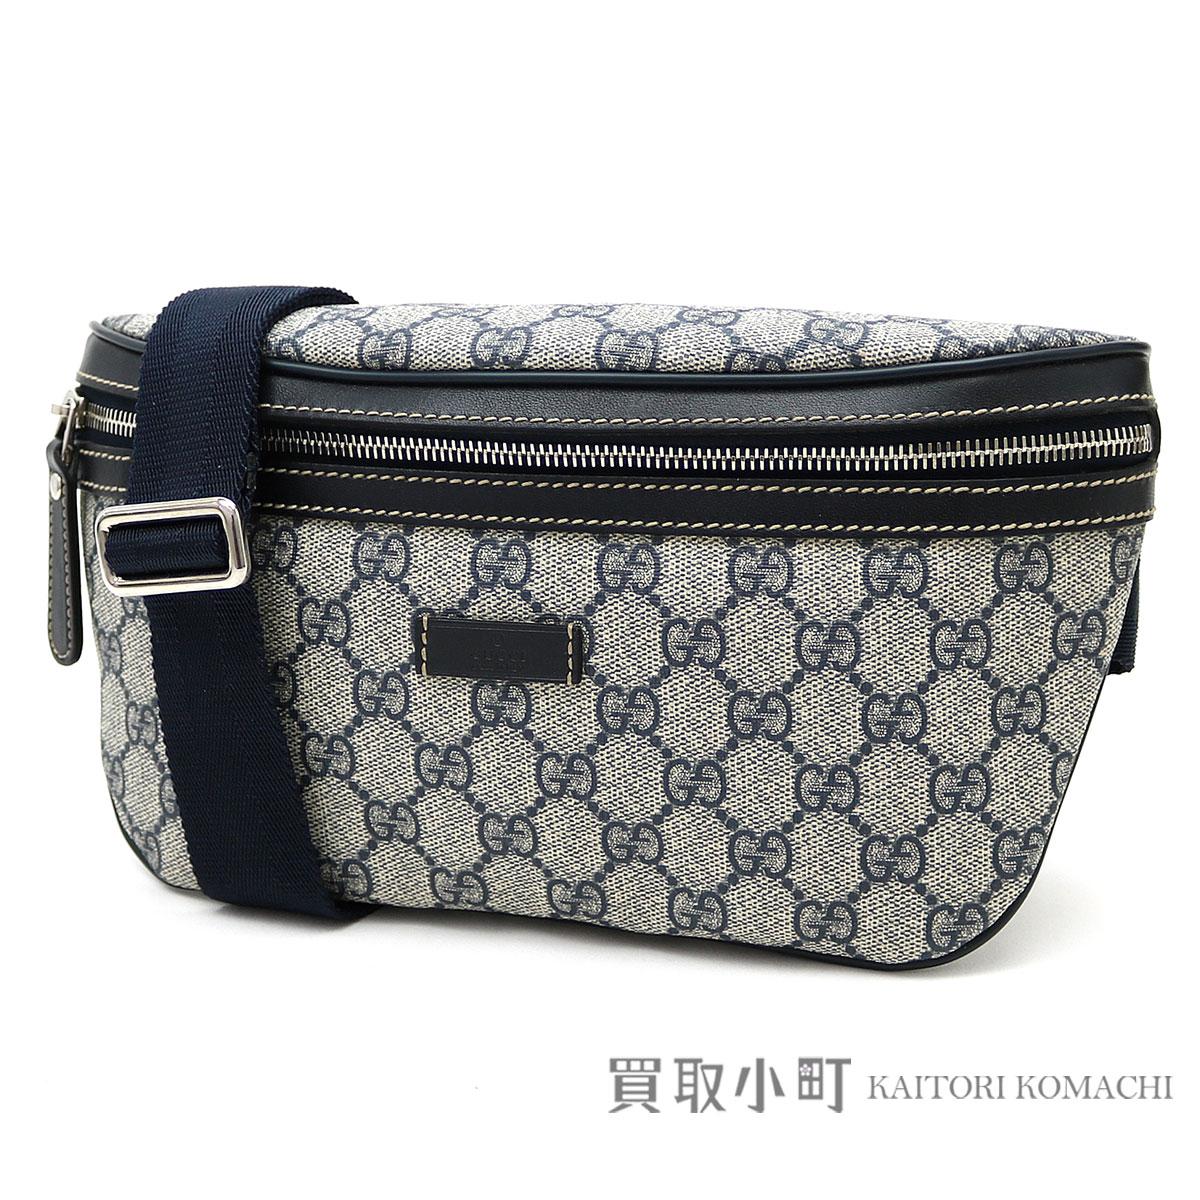 Take Gucci GG スプリームキャンバスベルトバッグネイビーブルーヒップバッグ slant  bum-bag crossbody bag  shoulder bag GG +233 925e2a16b5b47